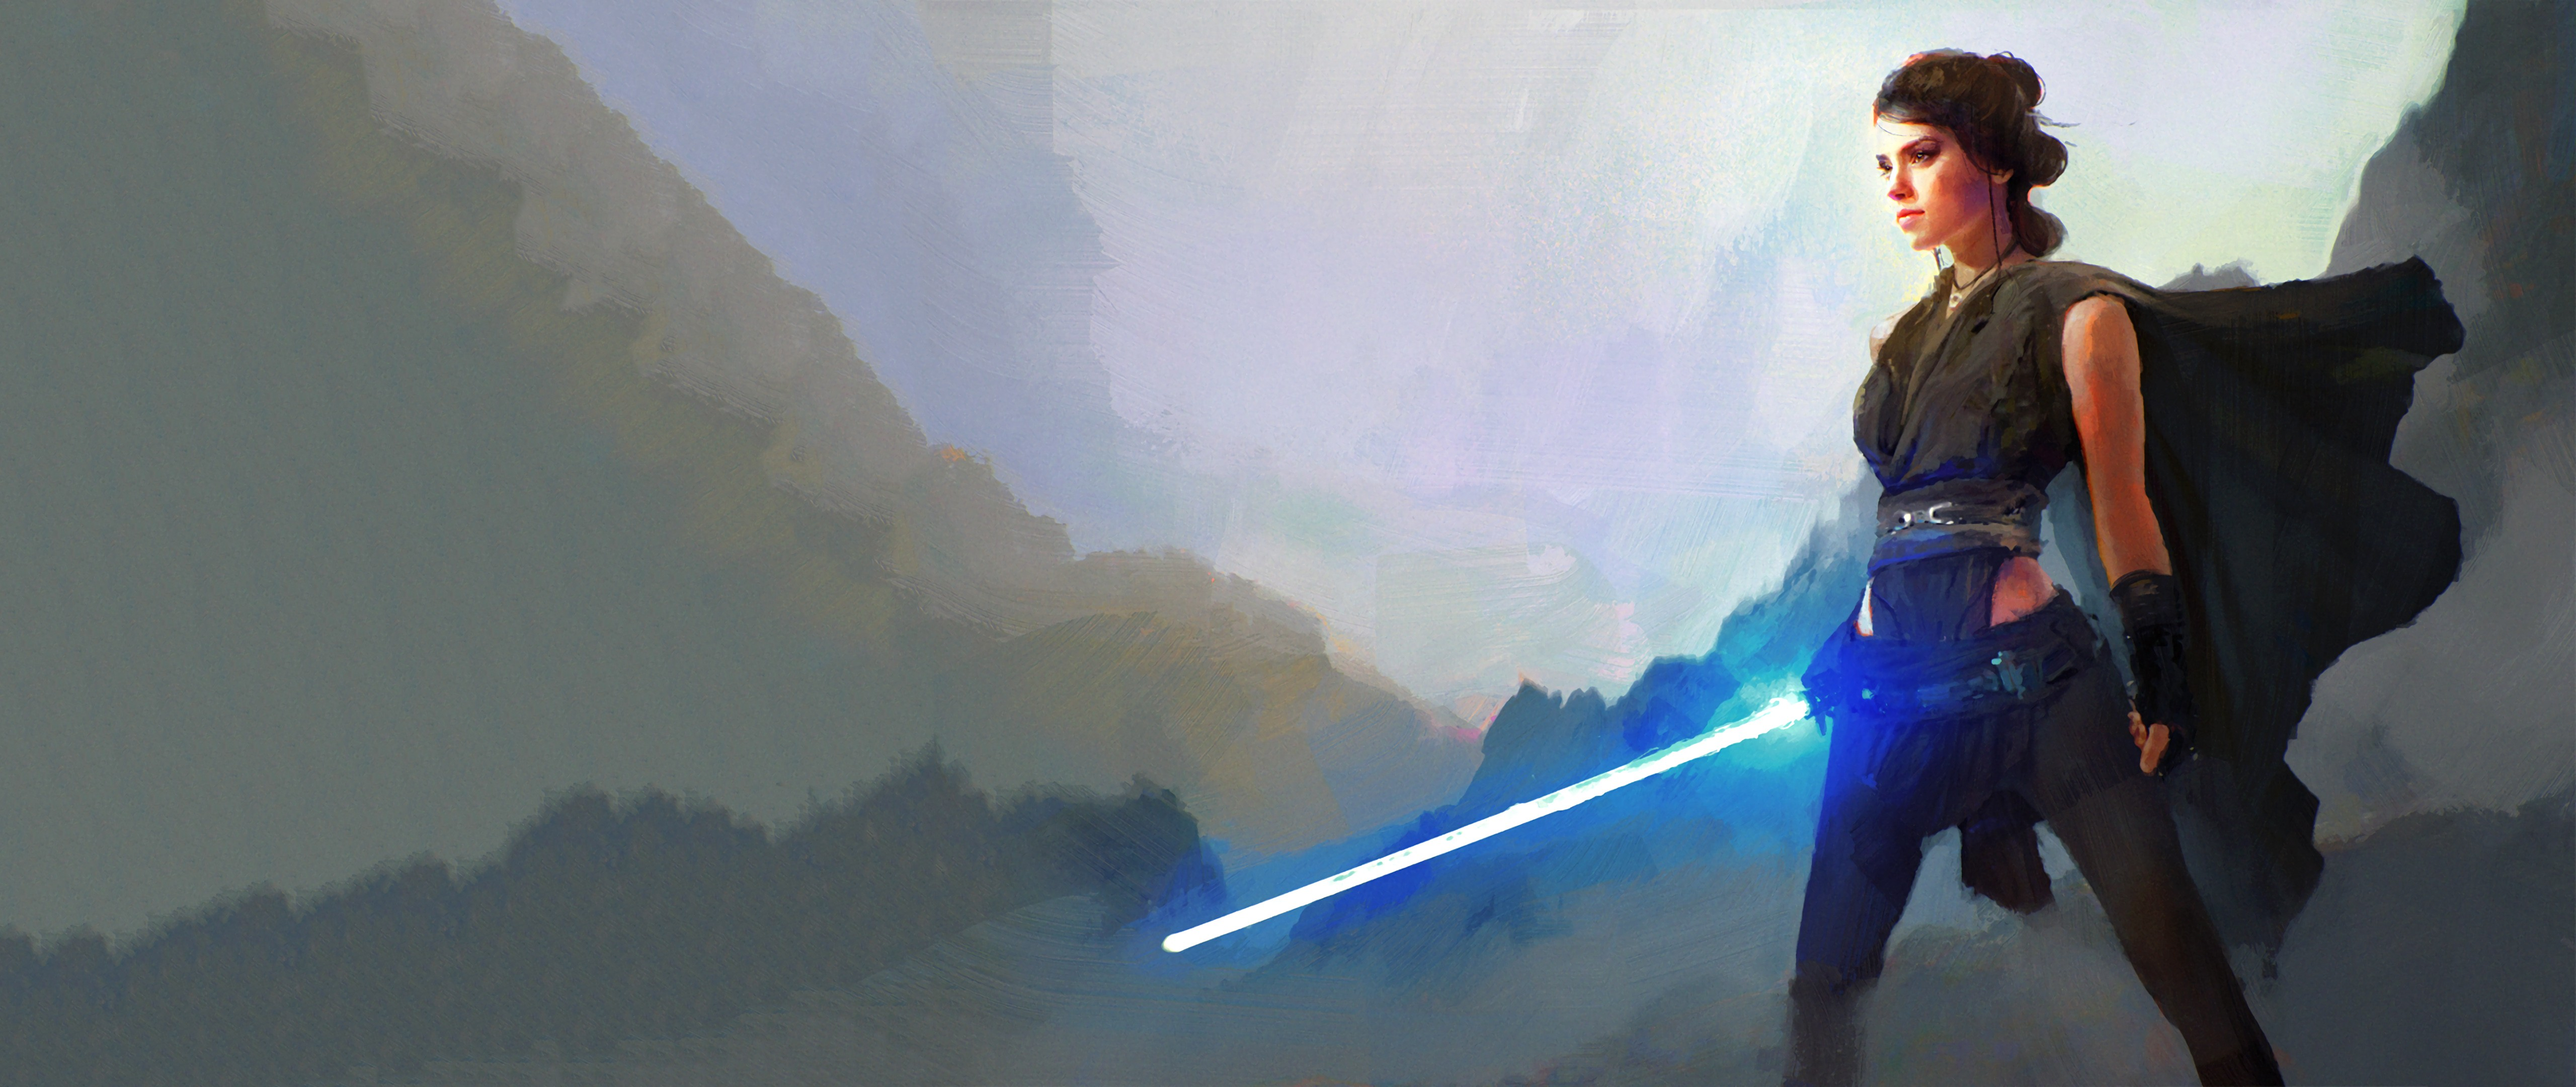 Star Wars 4k Ultra Hd Wallpaper Background Image 5120x2160 Id 855306 Wallpaper Abyss